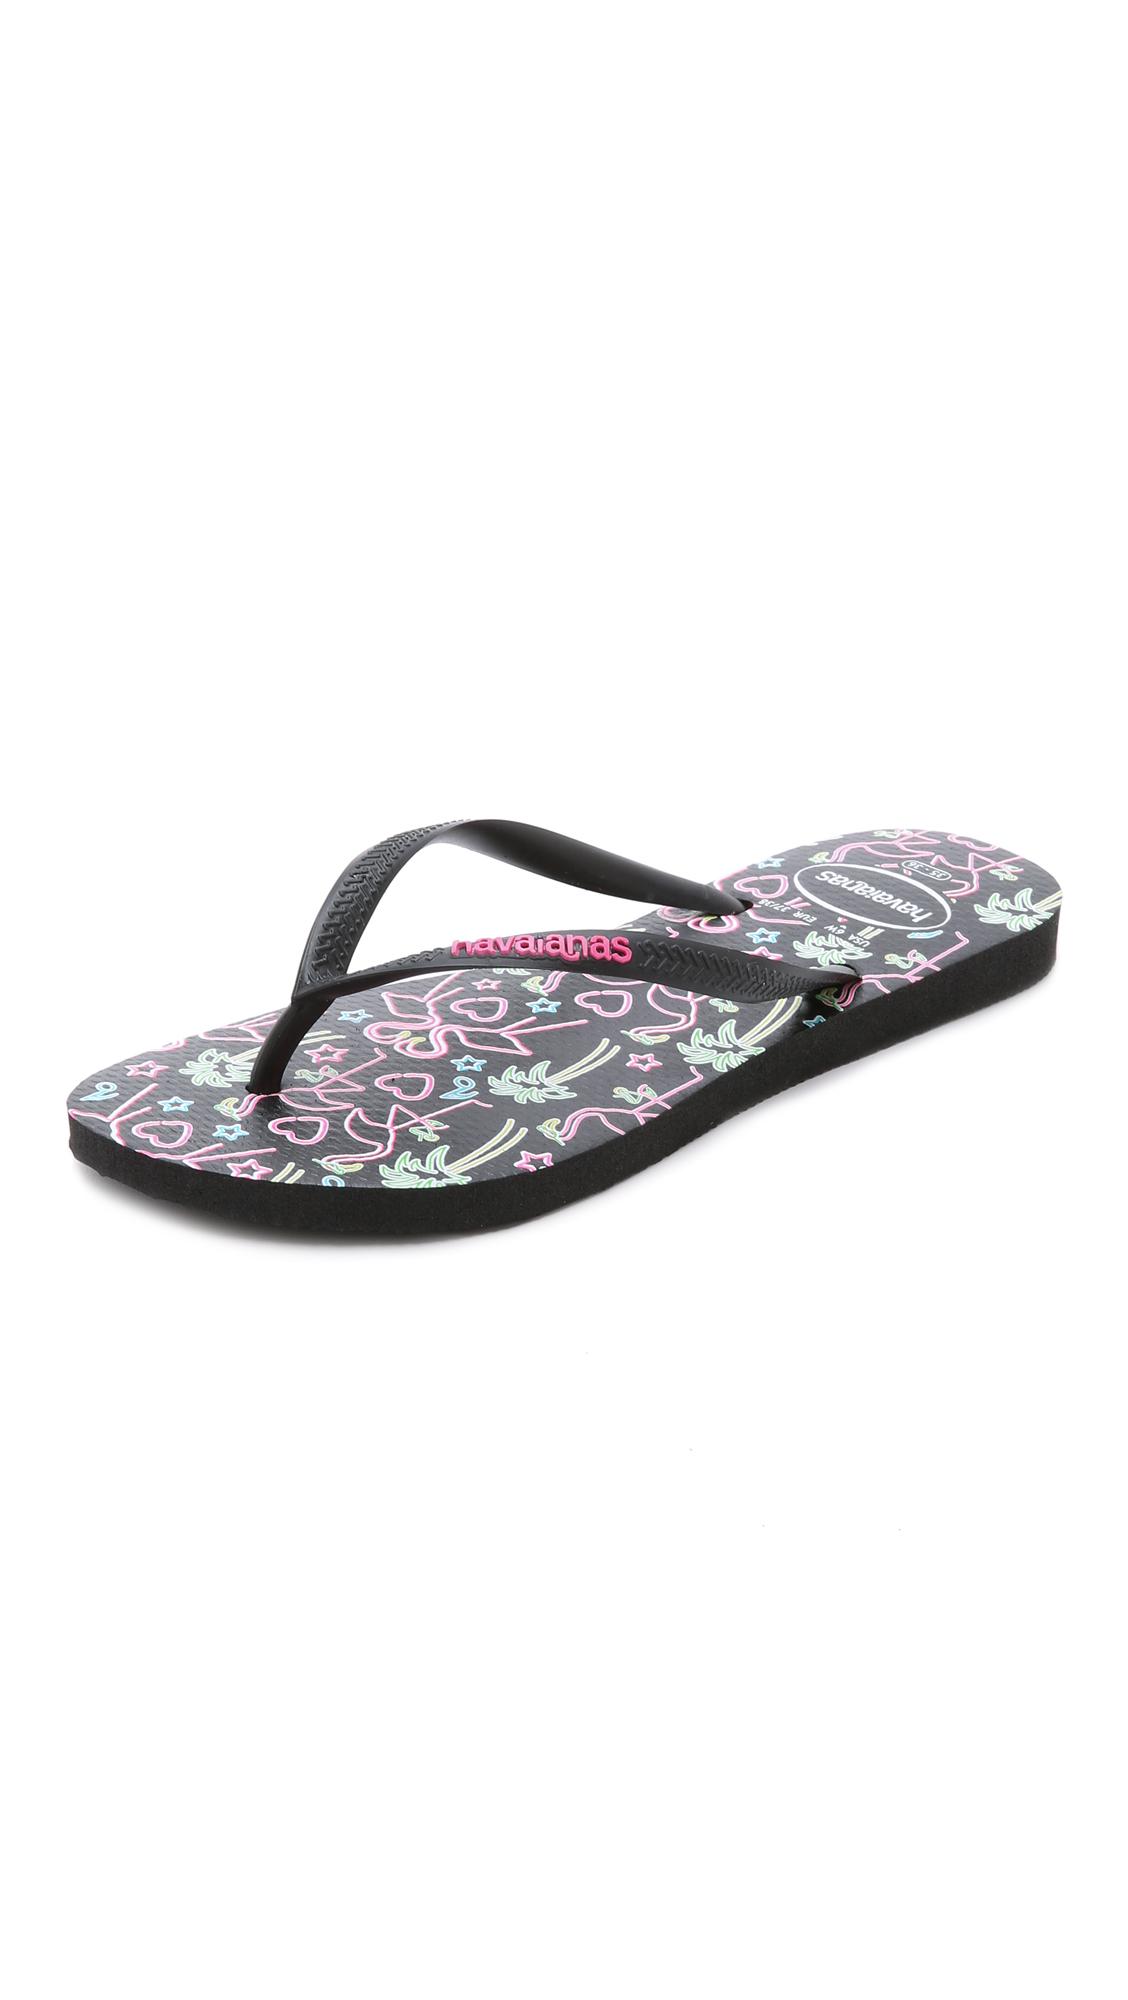 d1abf906bf755a Lyst - Havaianas Slim Flamingo Flip Flops - Black in Black